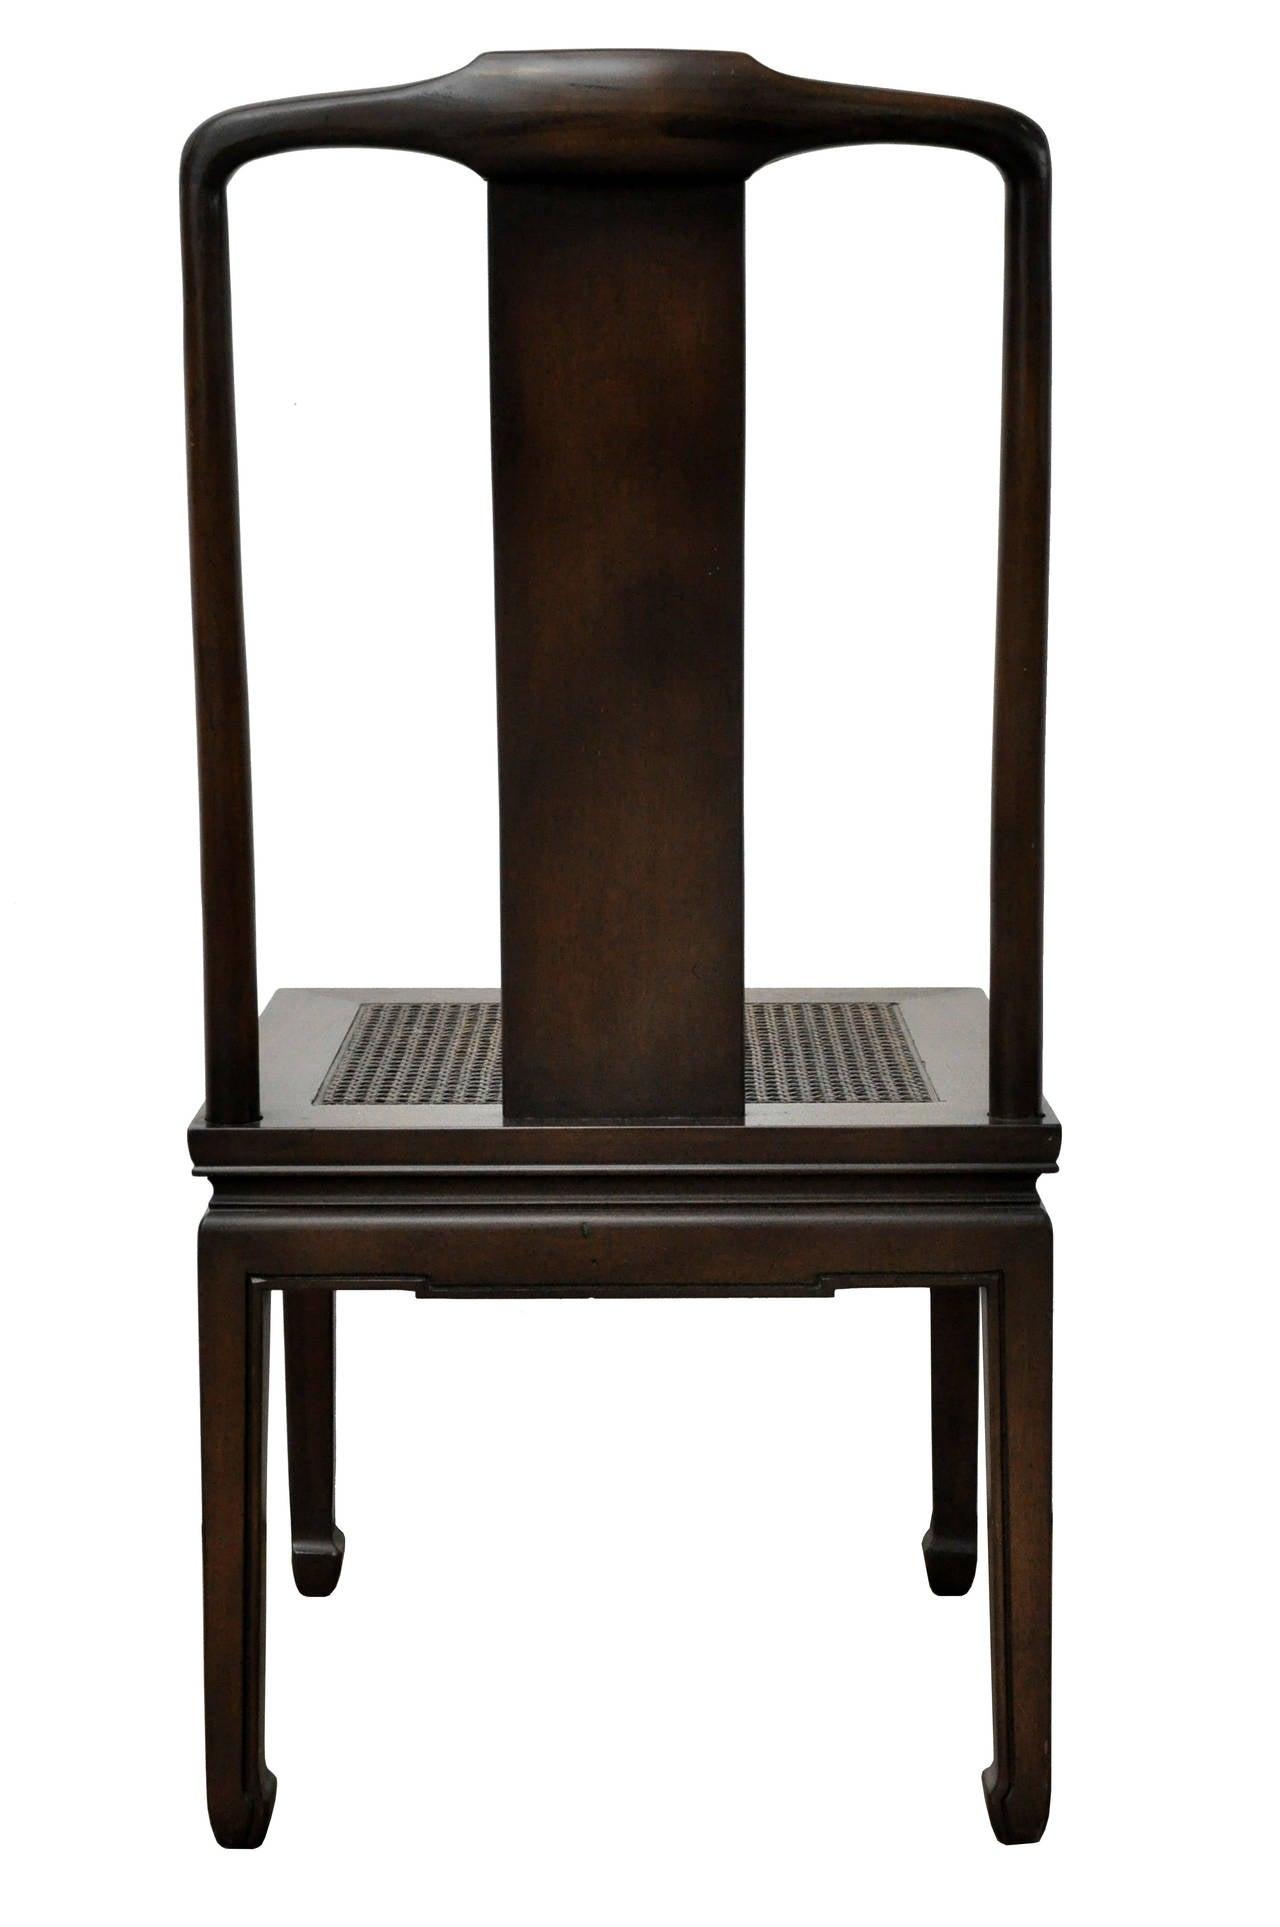 henredon asian dining chairs harley davidson chair set of six image 6